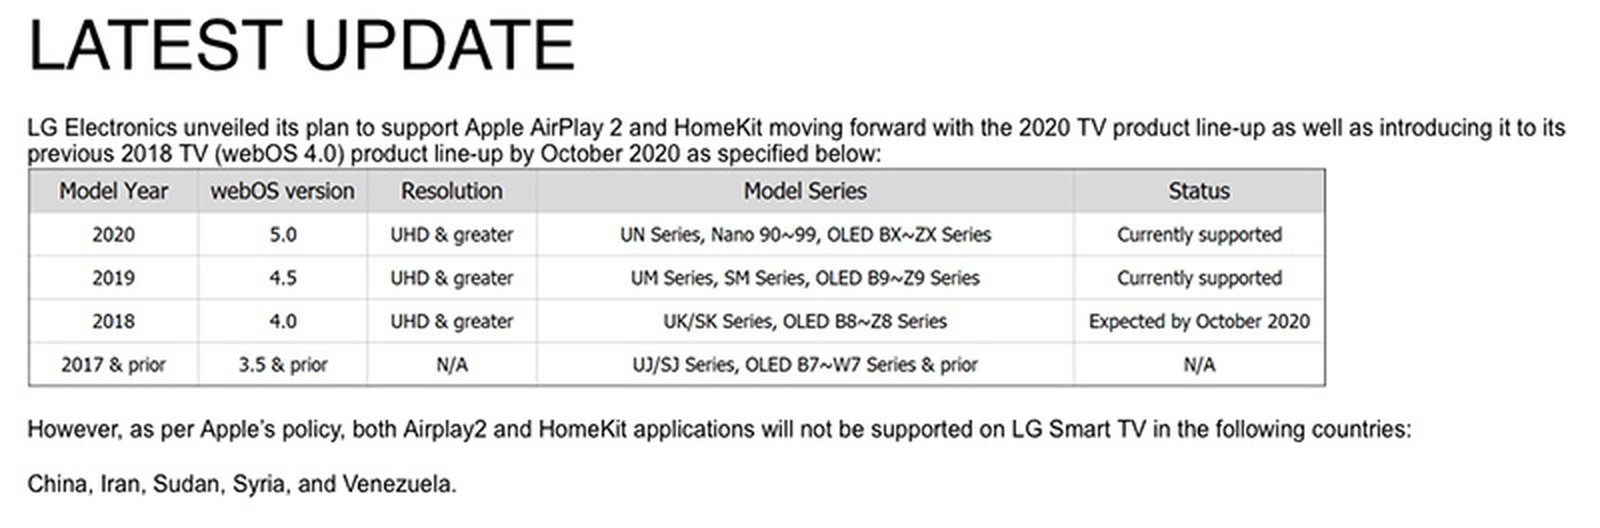 LG ci ripensa, niente AirPlay 2 e HomeKit sui televisori 2018